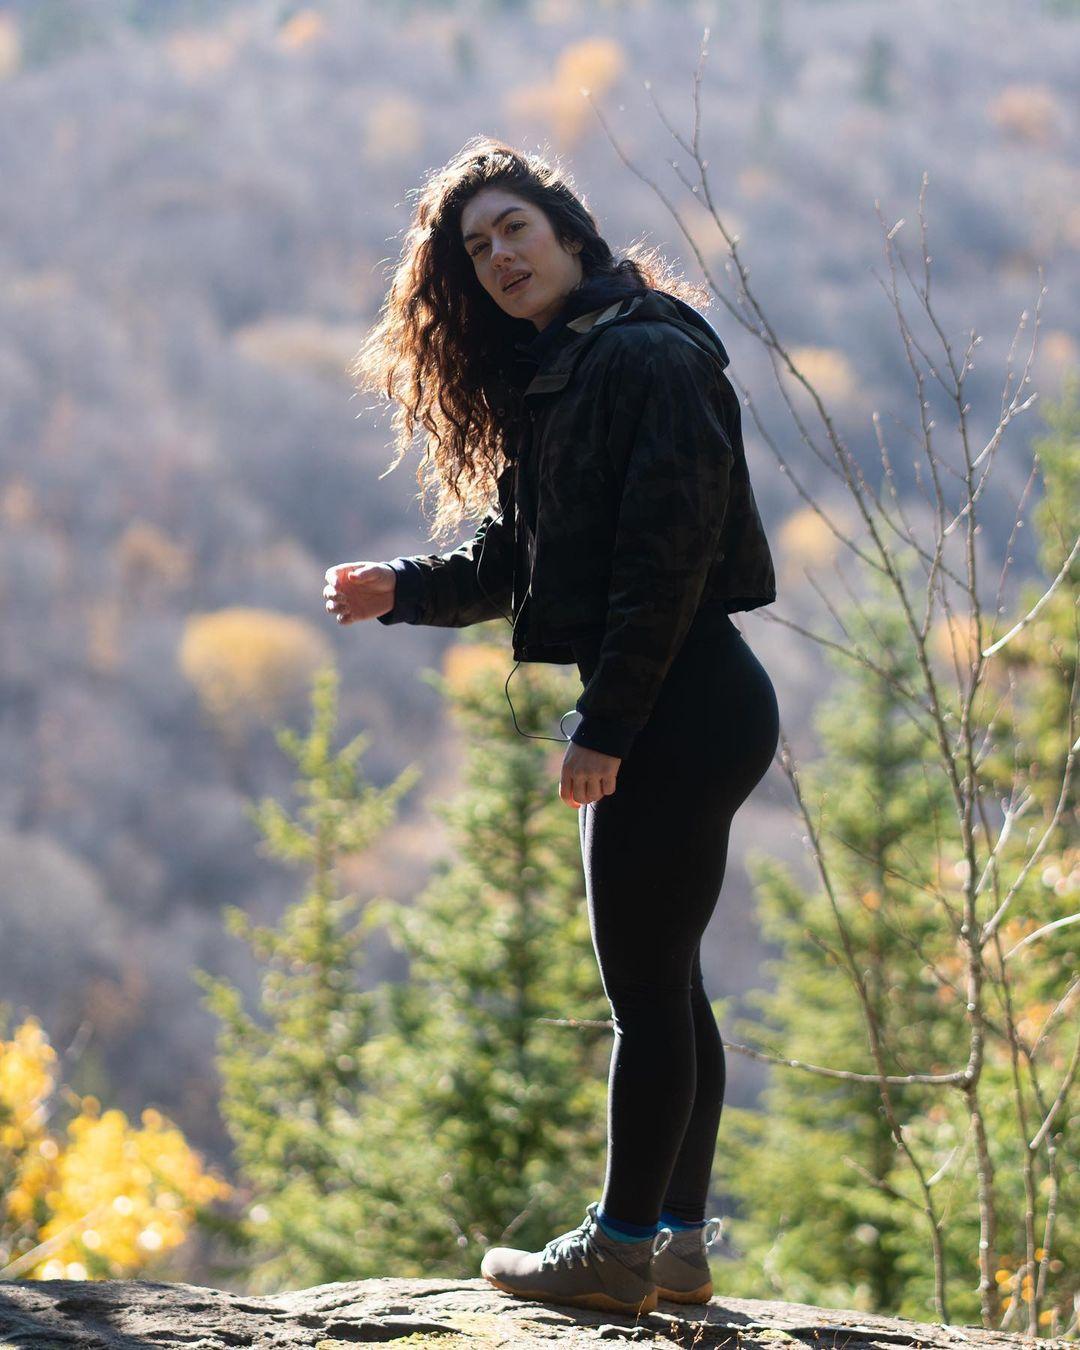 Natasha-Aughey-Wallpapers-Insta-Fit-Bio-1